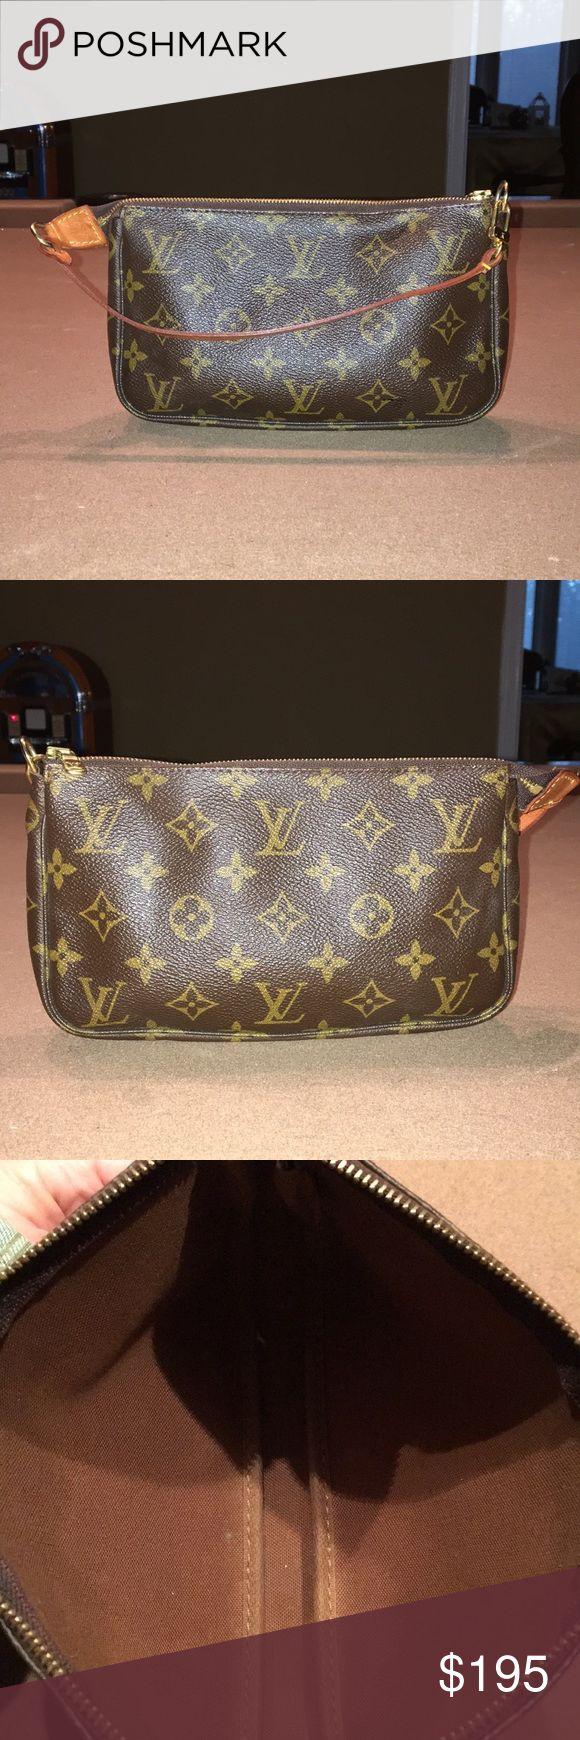 Louis Vuitton Pouchette Small Louis Vuitton Pouchette hand bag. Louis Vuitton Bags Clutches & Wristlets